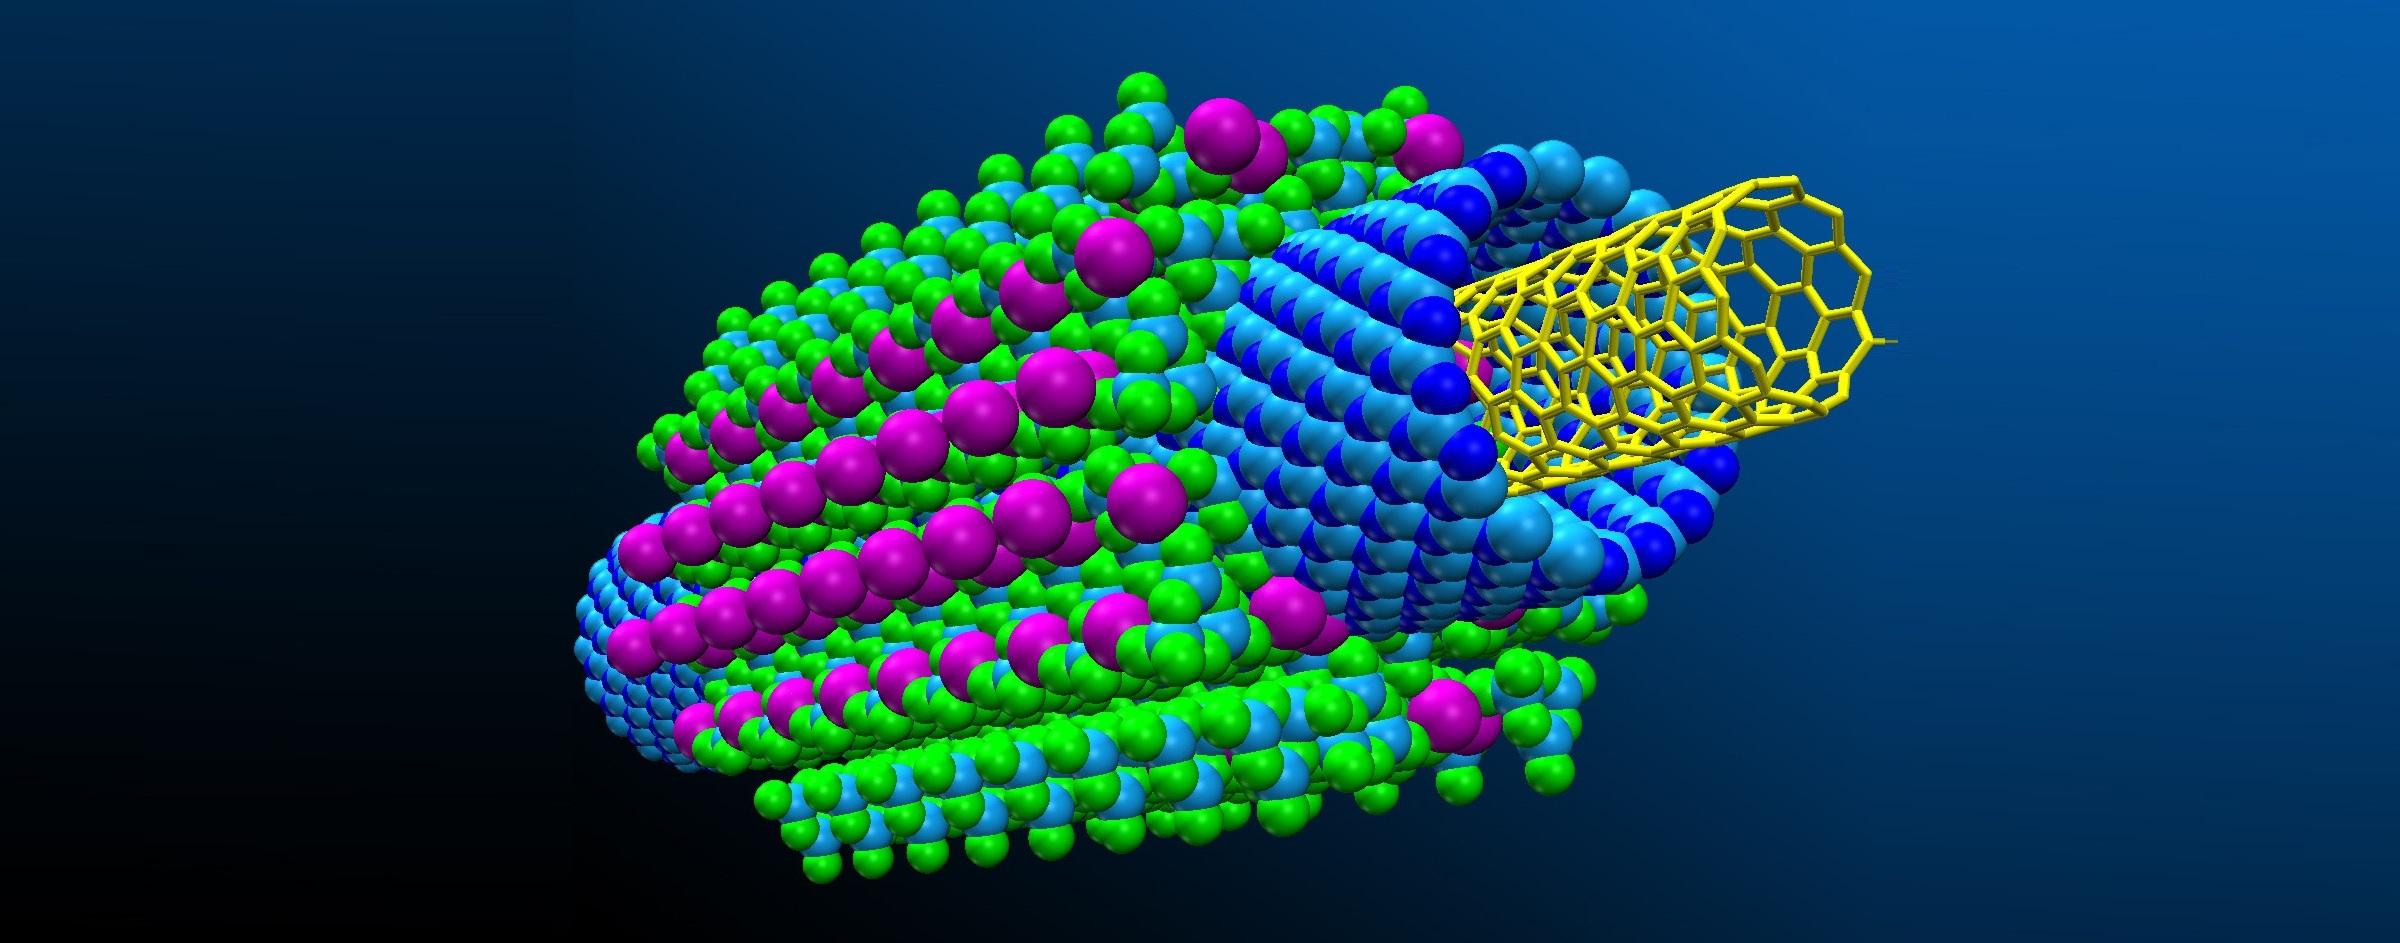 Nanotechnologies